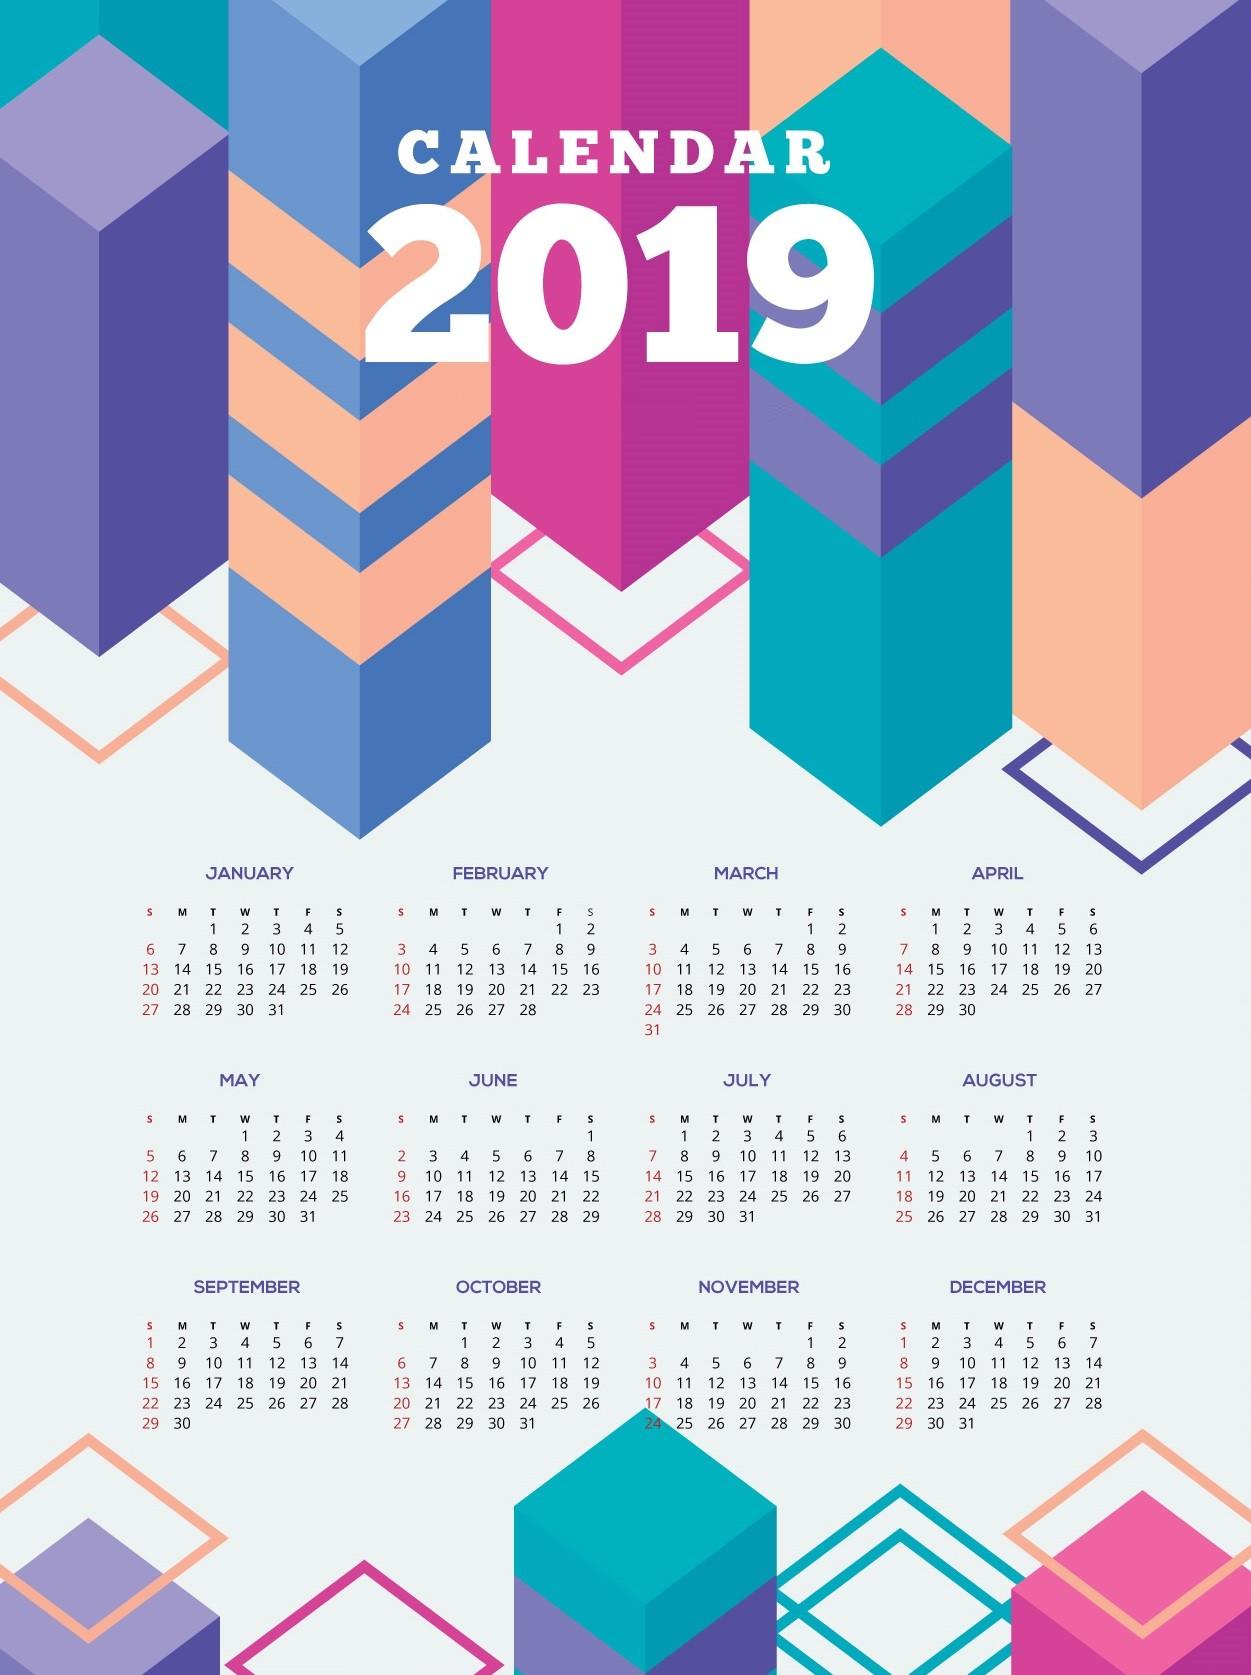 Geometric Calendar For 2019 Pretty Printable 2019 Calendar Pretty Printable 2019 Calendar Printable 2019 Calendar Free Download